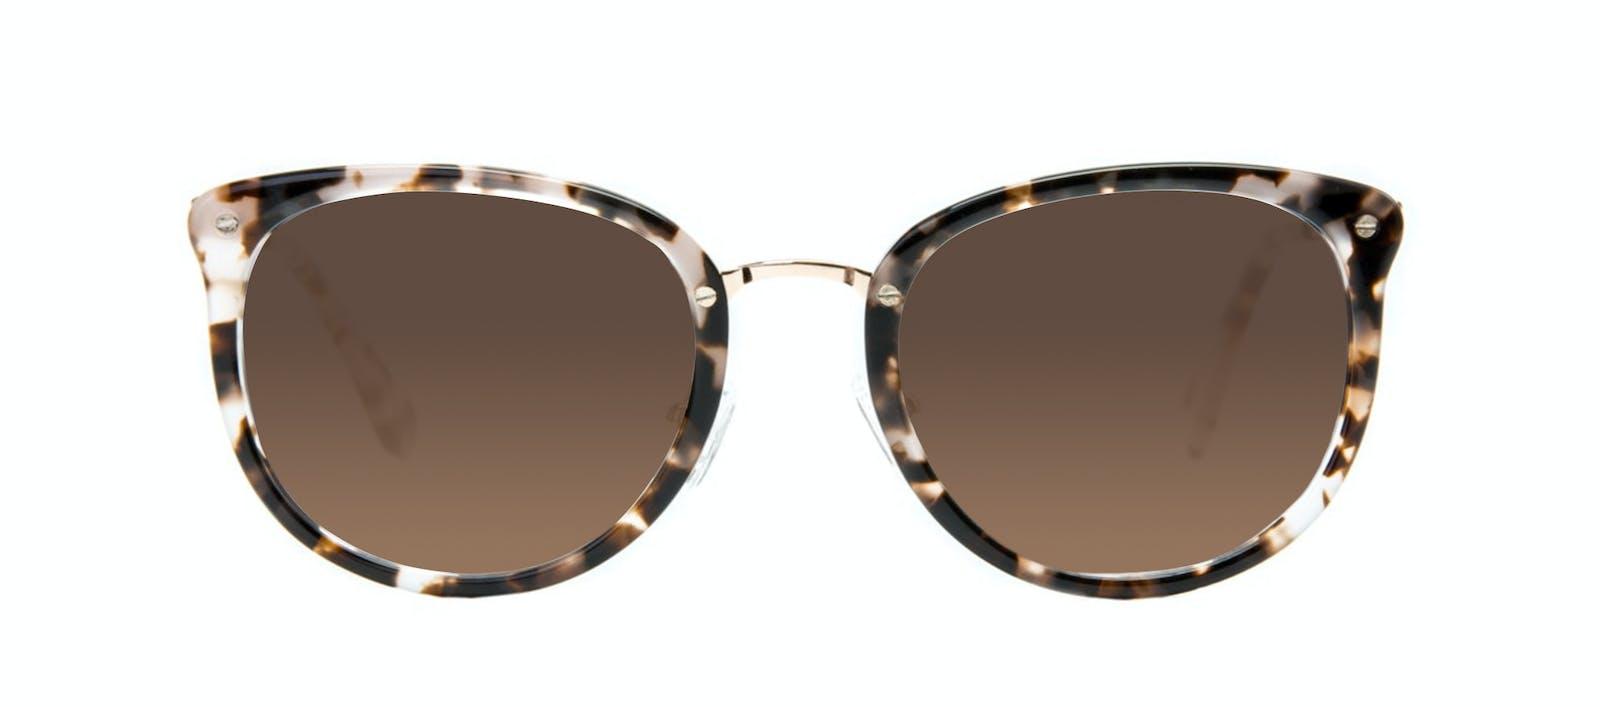 0f2f8d10ba Affordable Fashion Glasses Square Round Sunglasses Women Amaze Mocha  Tortoise Front